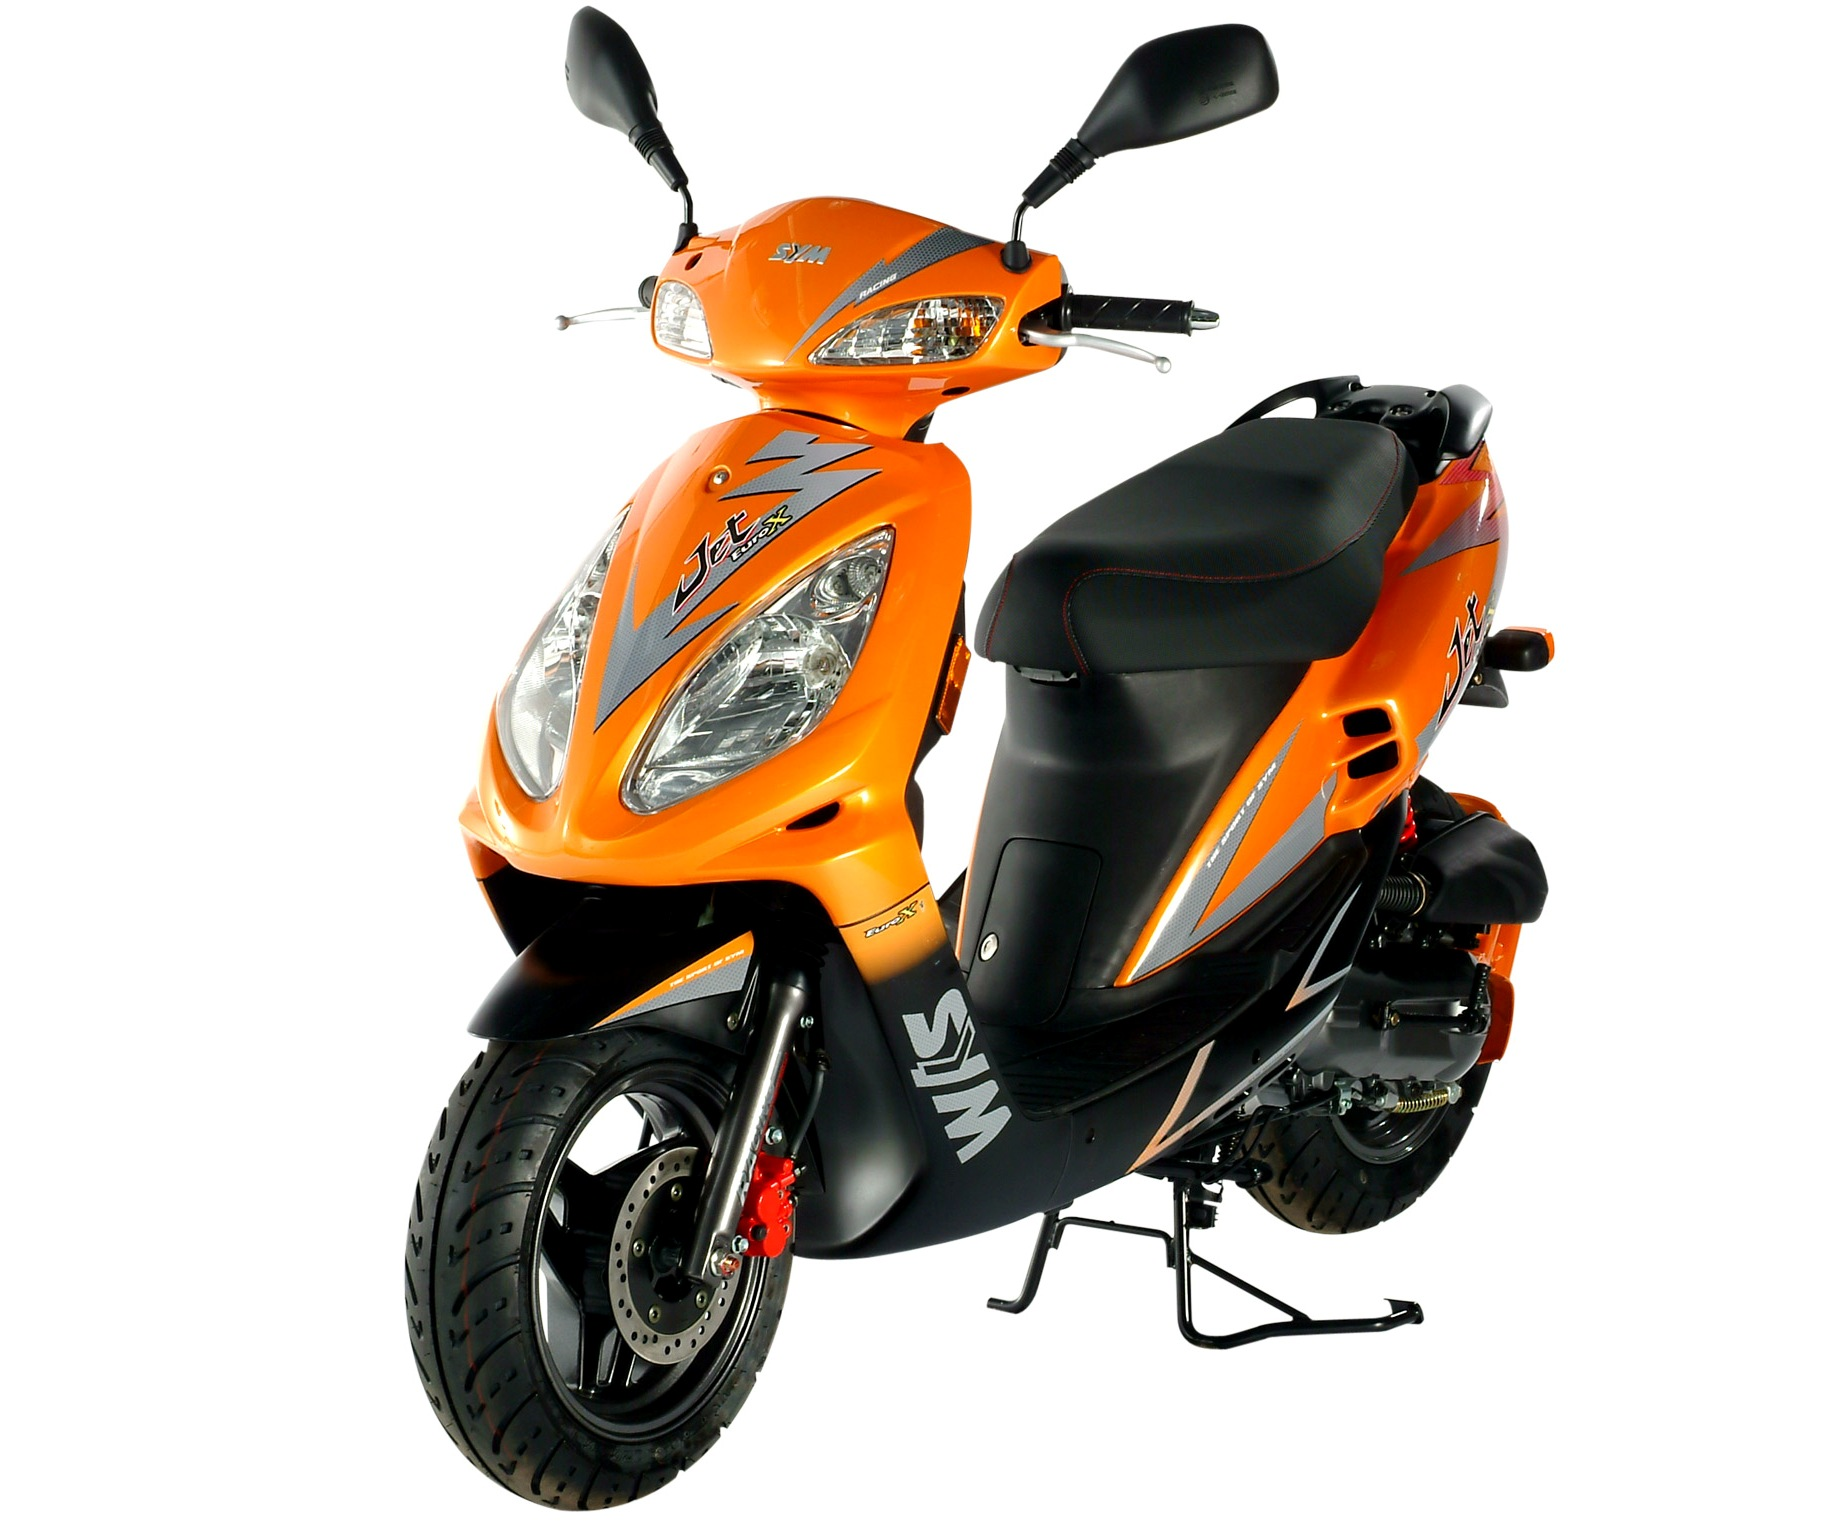 sym jet eurox 50cc scooterfun rentals your scooter rental company kalymnos greece. Black Bedroom Furniture Sets. Home Design Ideas